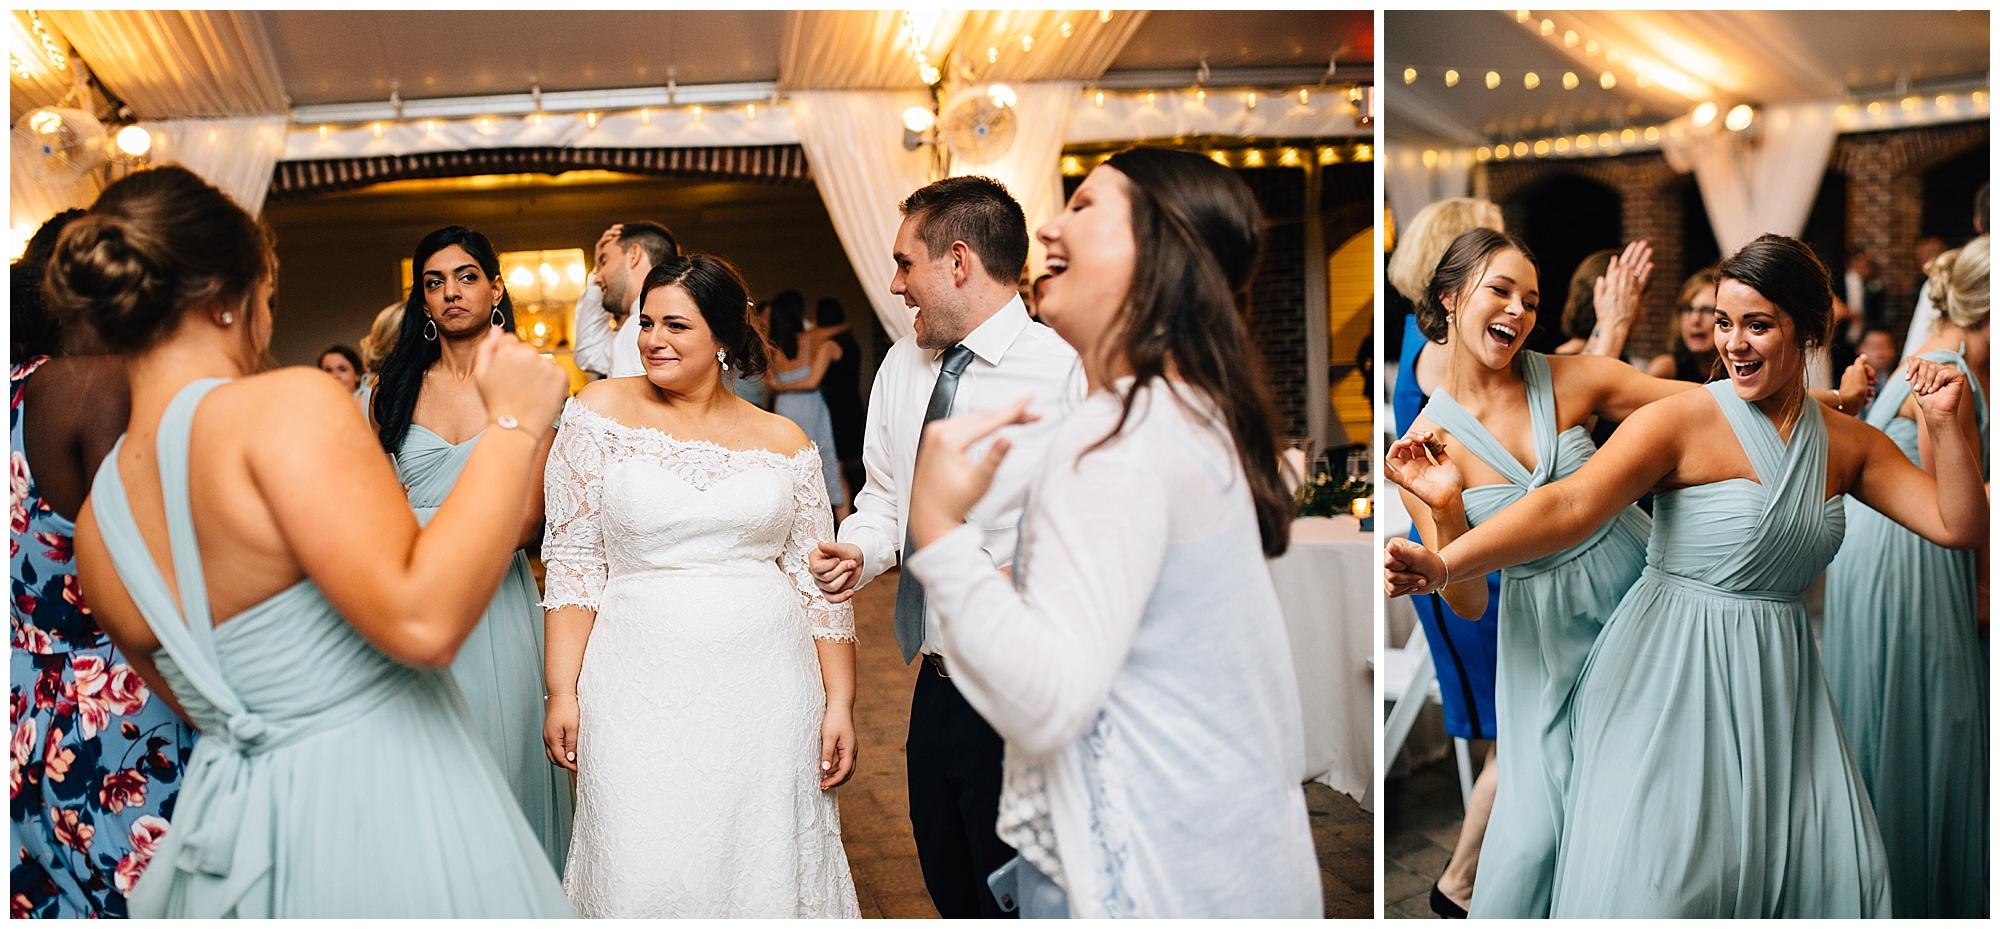 Oaks-at-salem-wedding-apex-photography-116.jpg